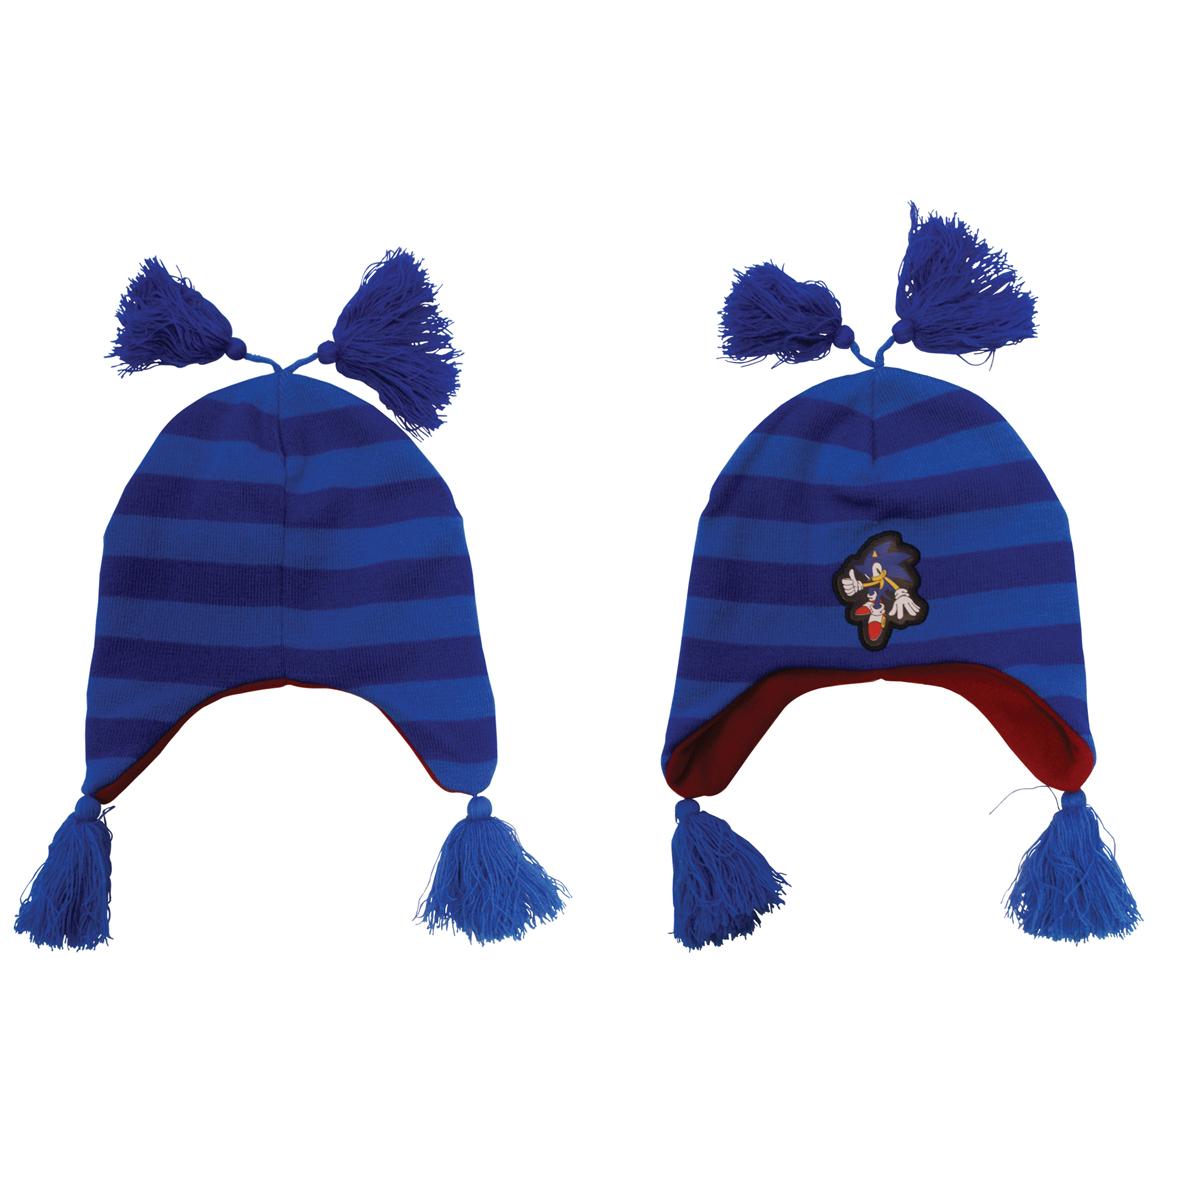 Sega Blue Striped Beanie With Poms